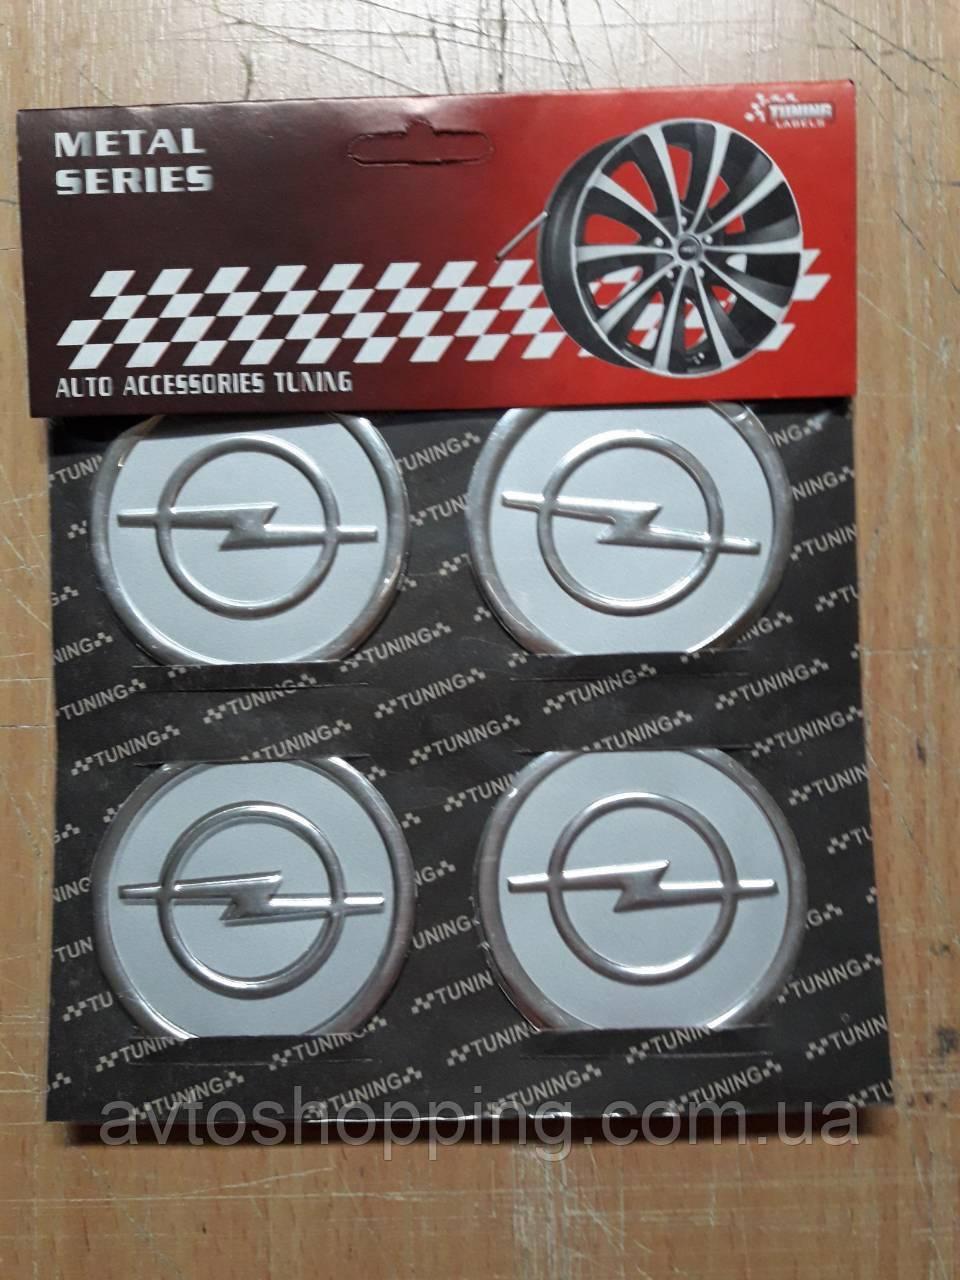 Наклейки на ковпачки, заглушки, наклейки на диски 60 мм Opel Опель хром